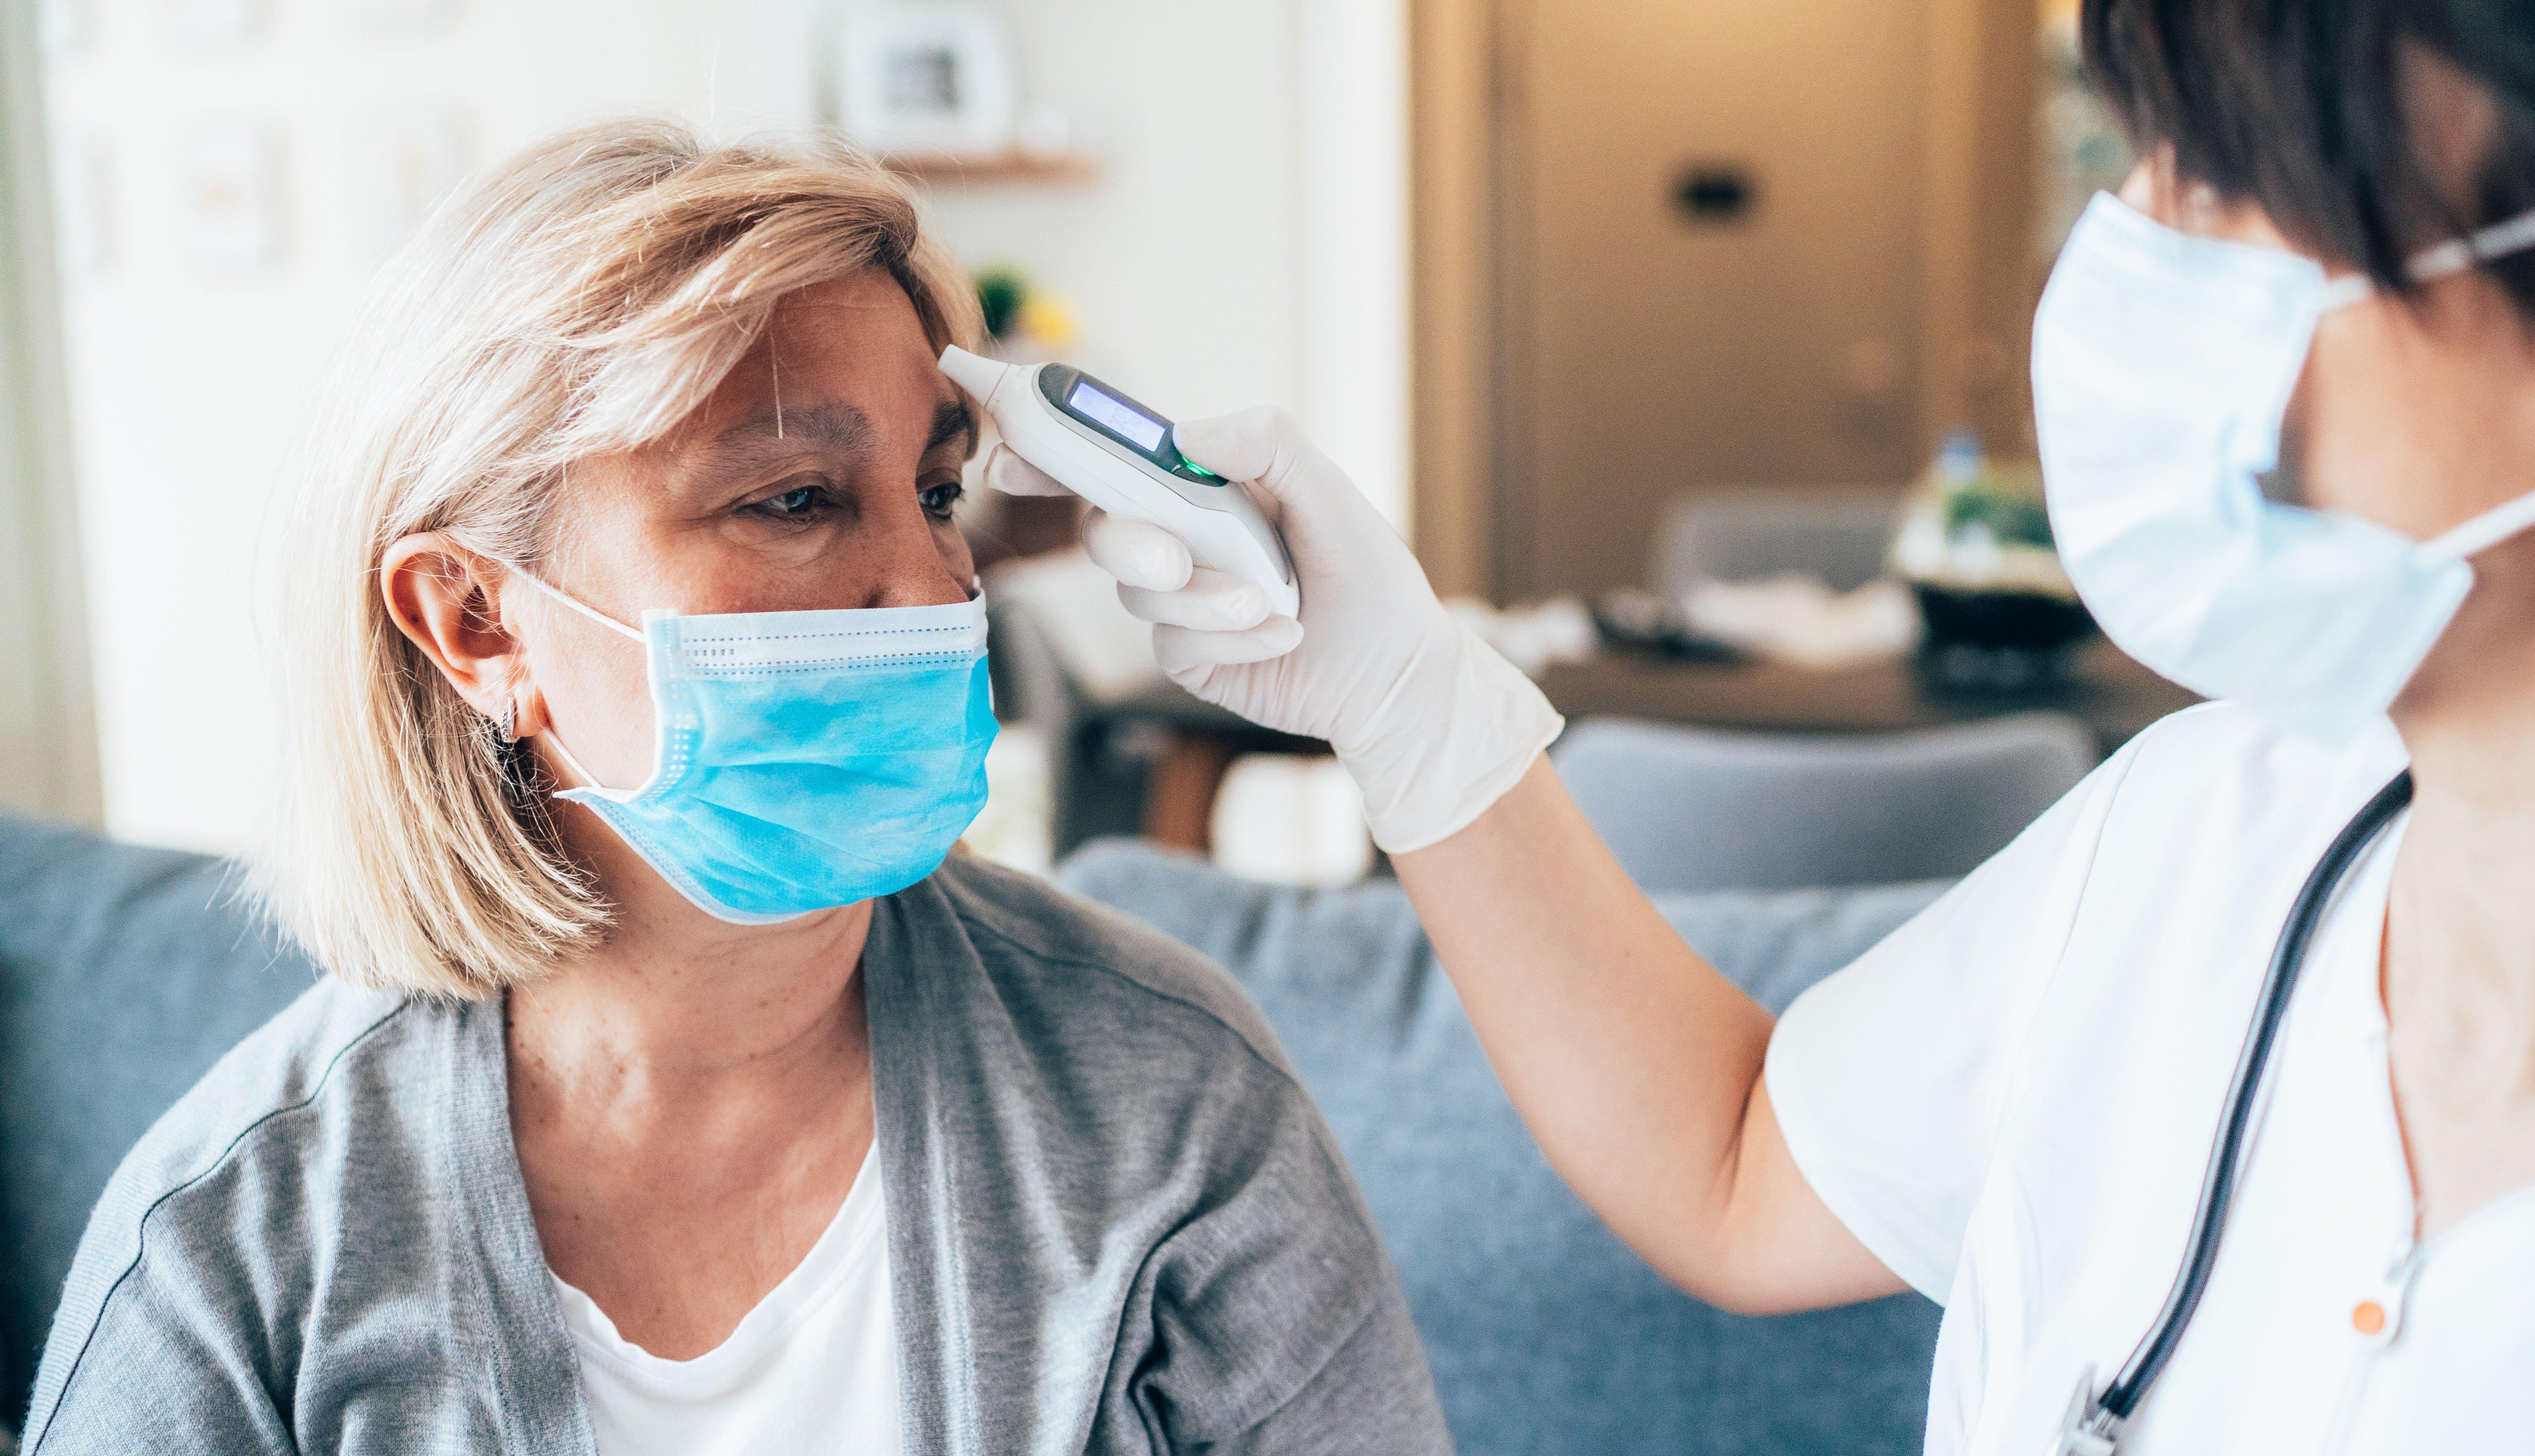 female patient getting her temperature taken